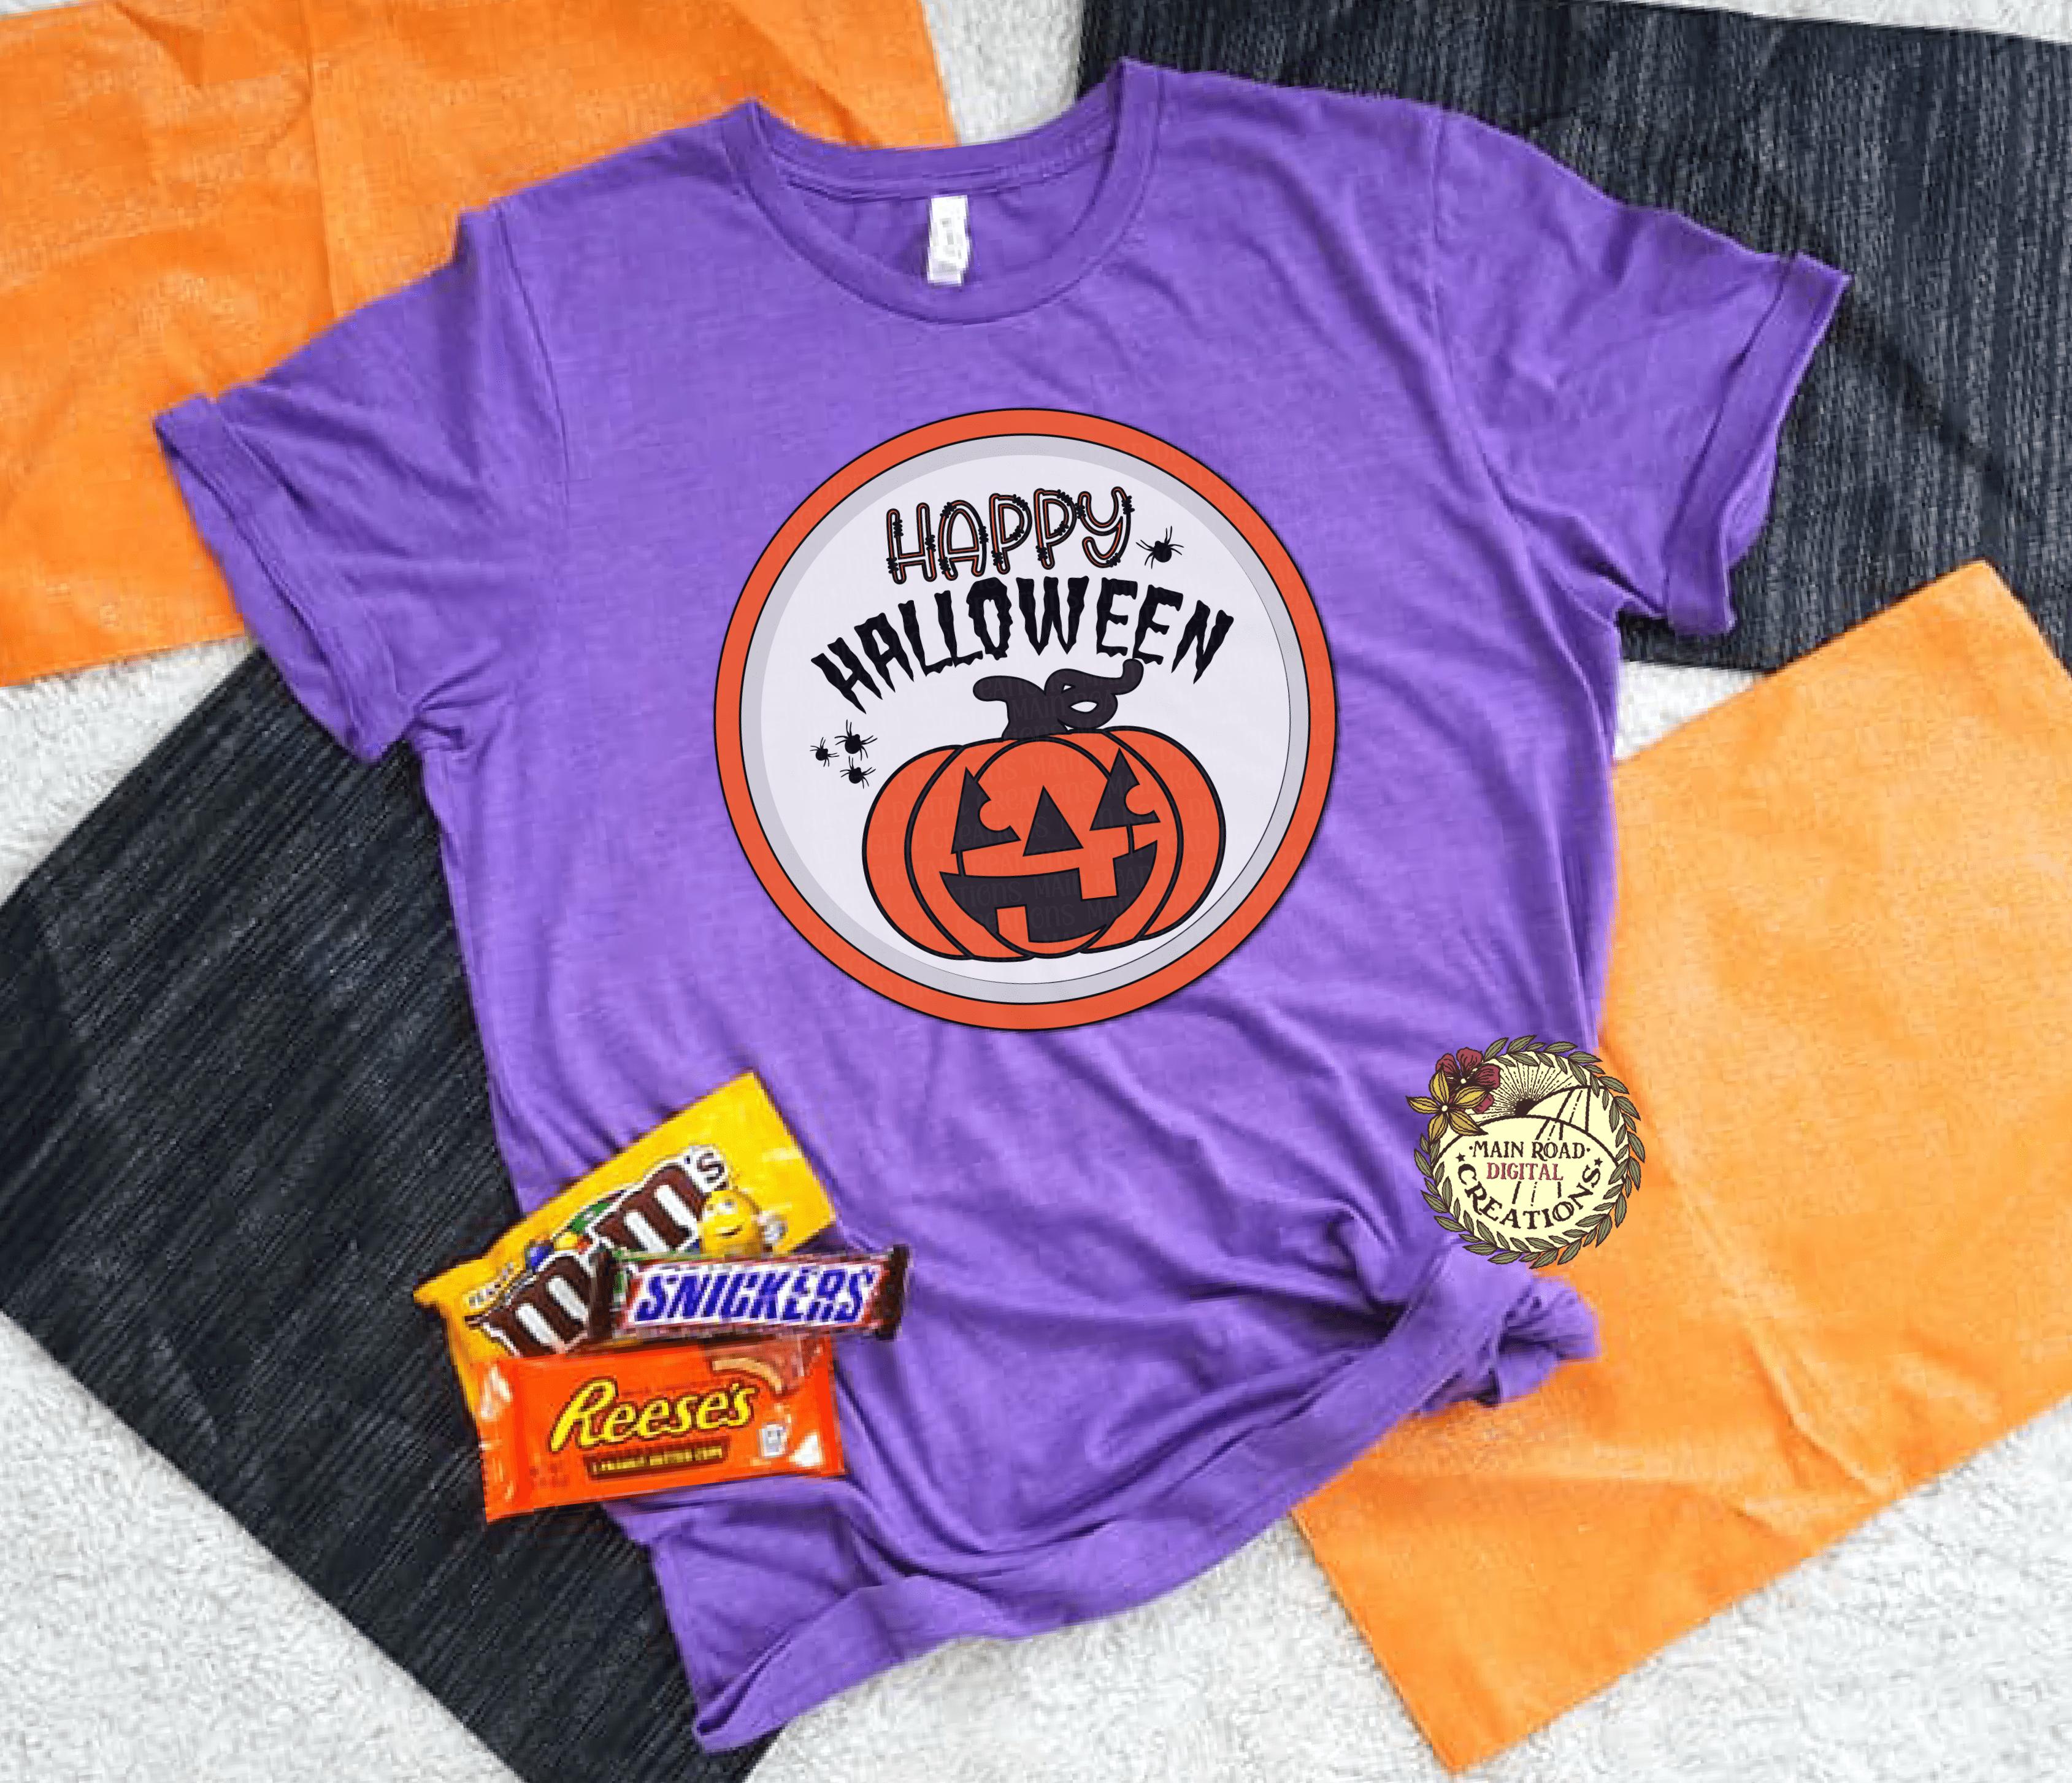 free halloween svg, free fall svg, pumpkin svg free, trick or treat bag svg free, happy halloween pumpkin shirt free svg